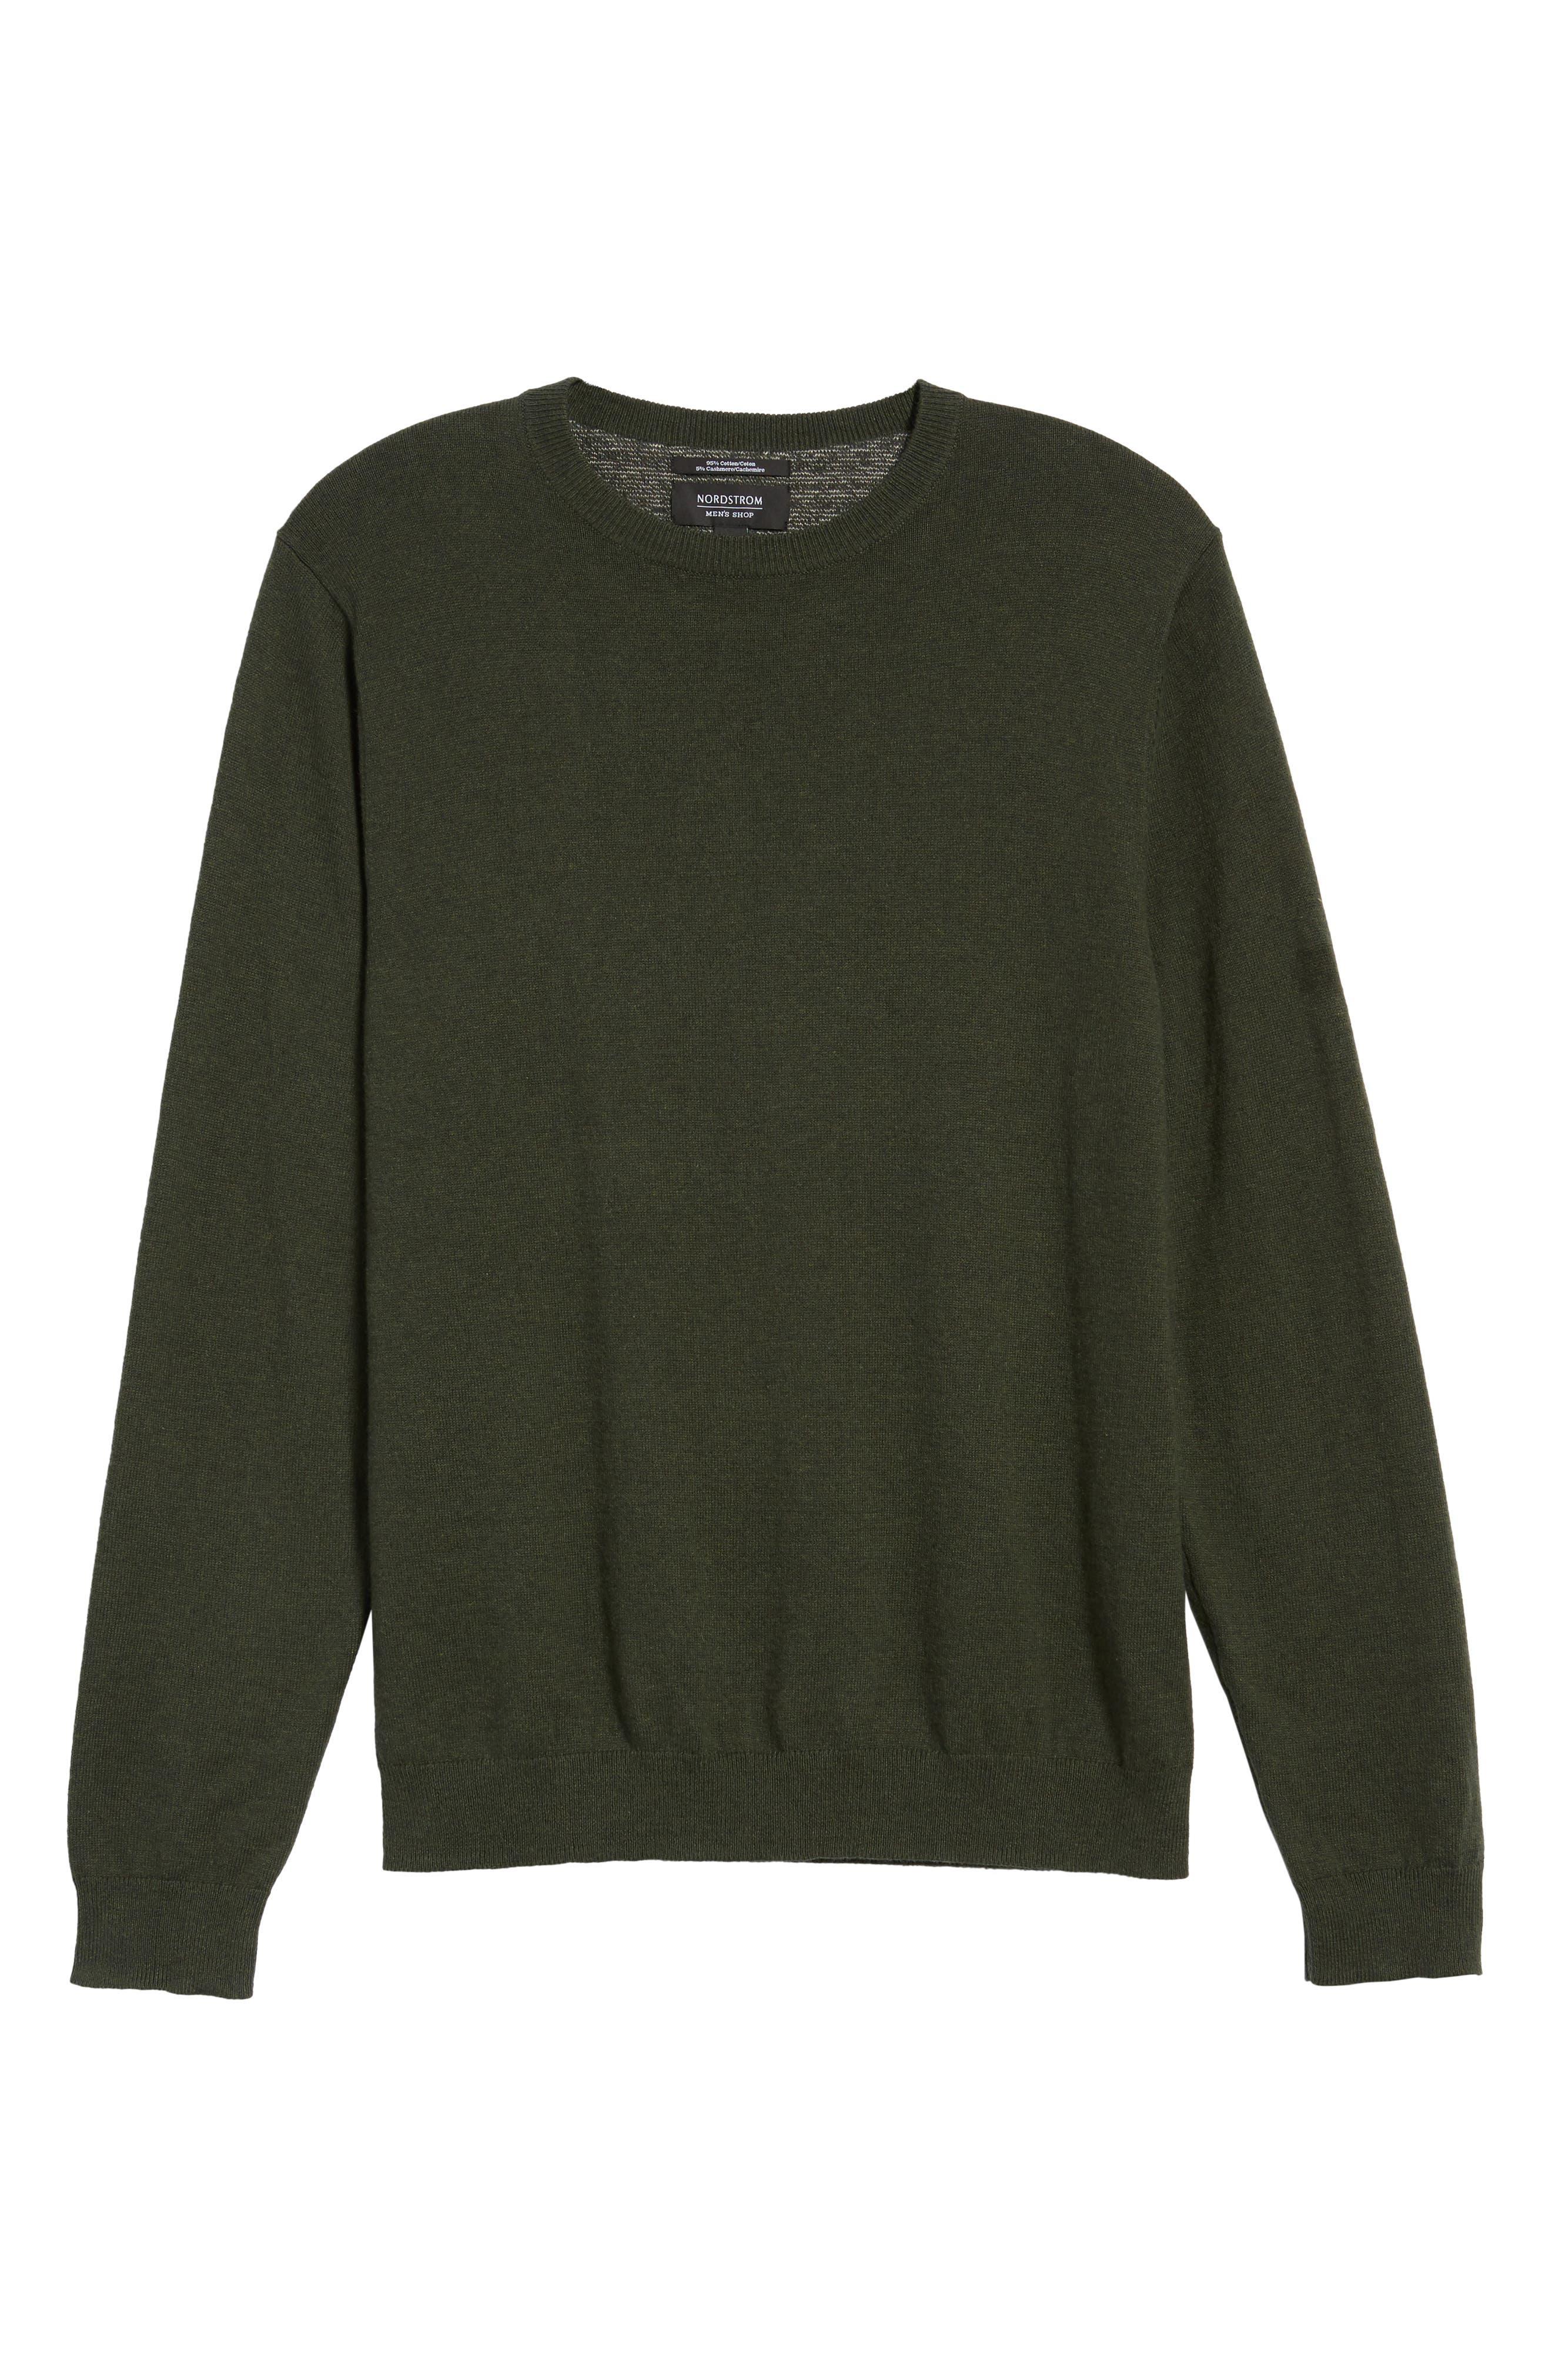 Cotton & Cashmere Crewneck Sweater,                             Alternate thumbnail 6, color,                             Green Deep Pine